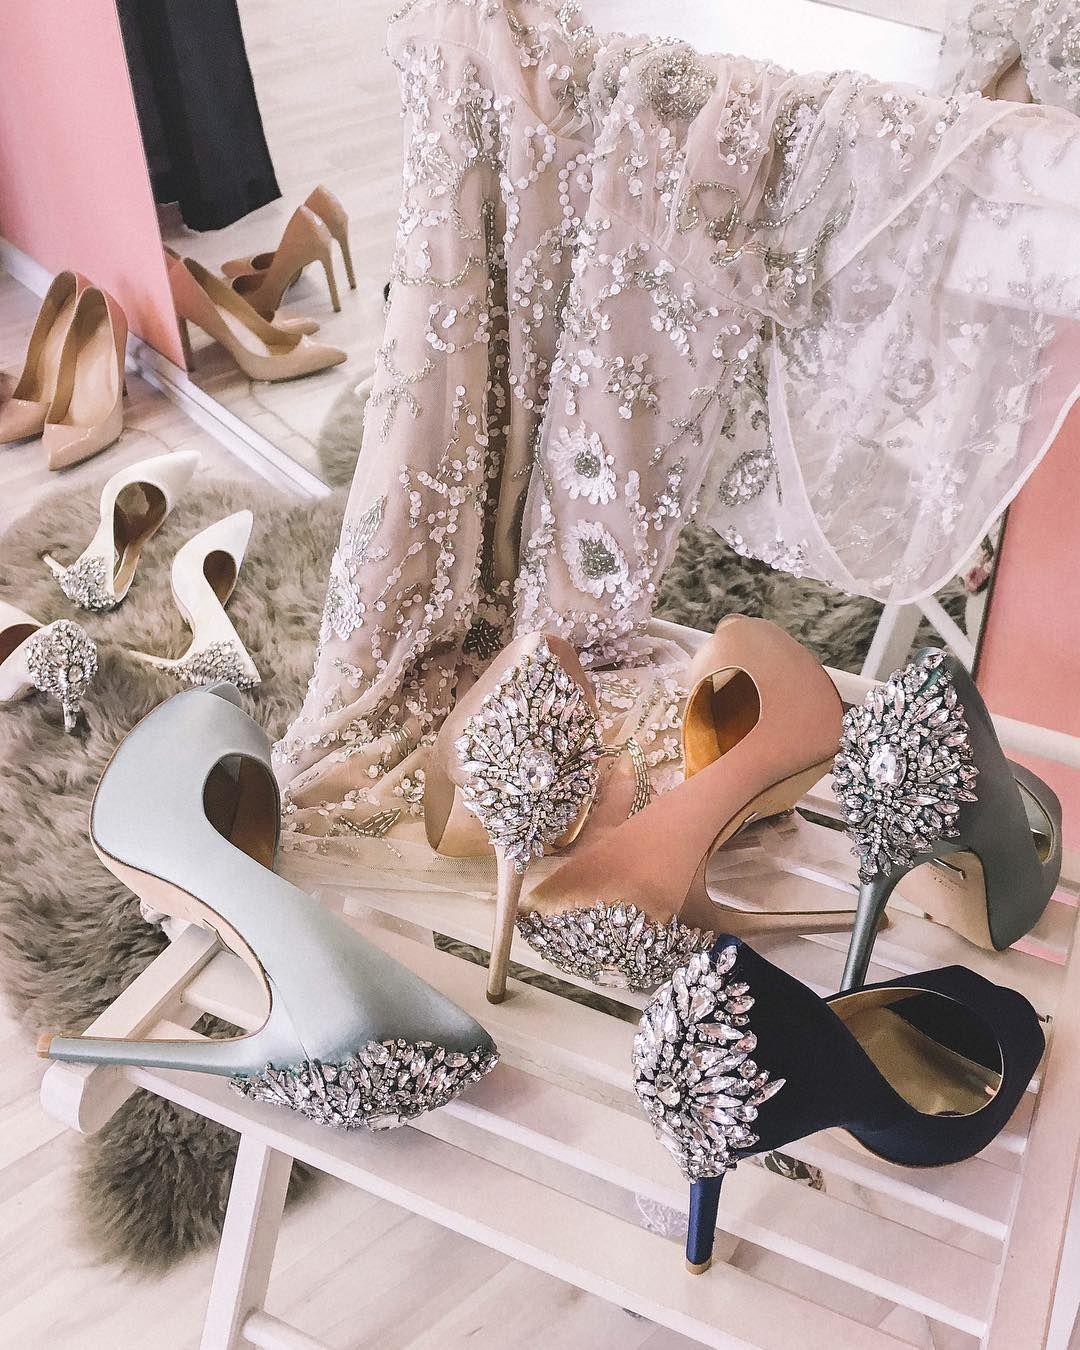 aaa196d9bff 10 самых крутых туфель для свадьбы  Badgley Mischka Kiara blue and pink  Wedding Shoes